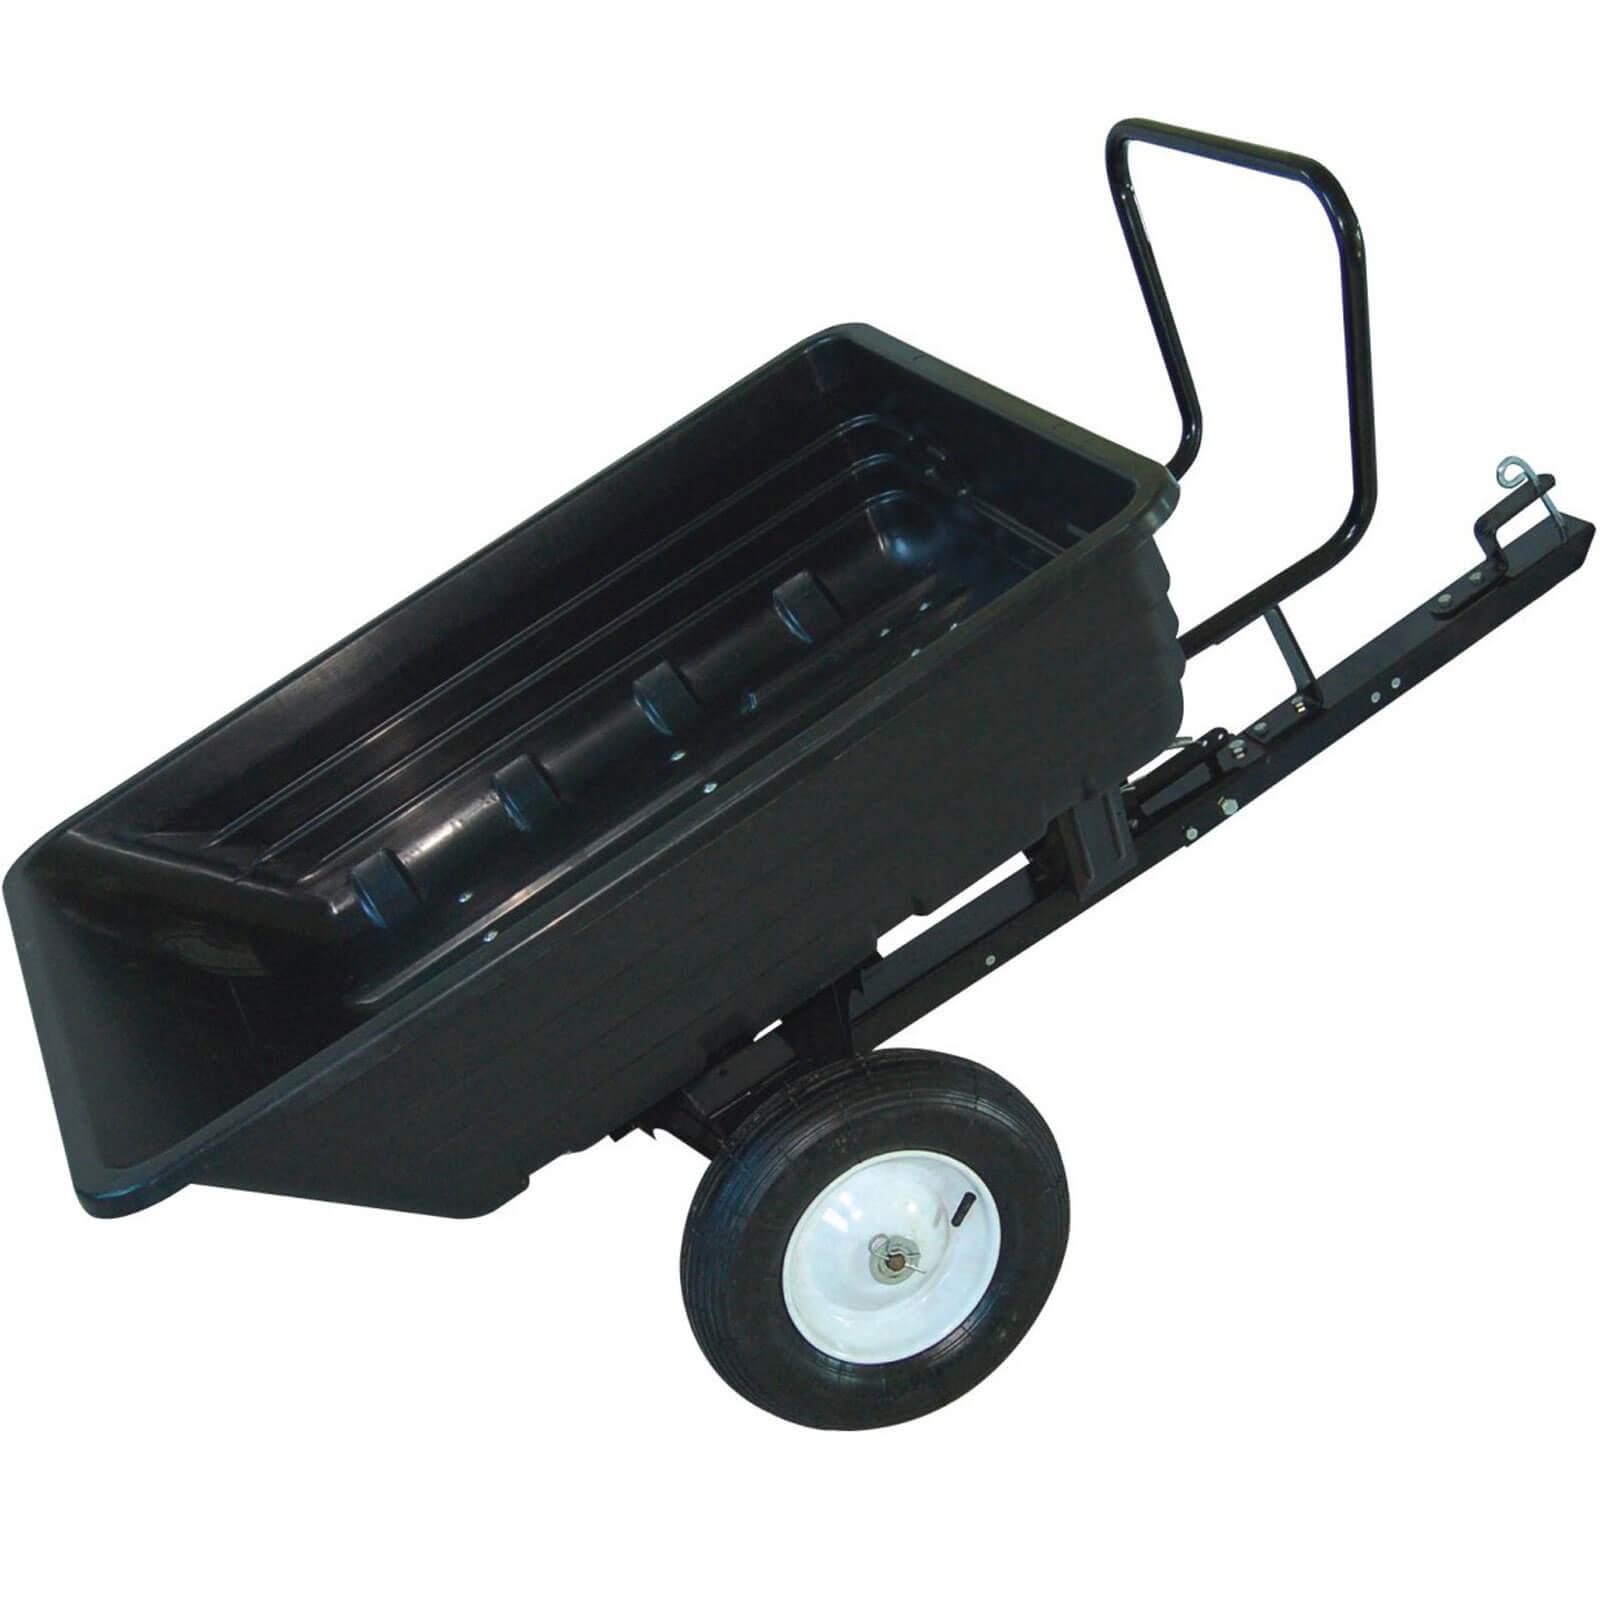 Handy TPDC Poly Body Garden Dump Cart 295kg Capacity